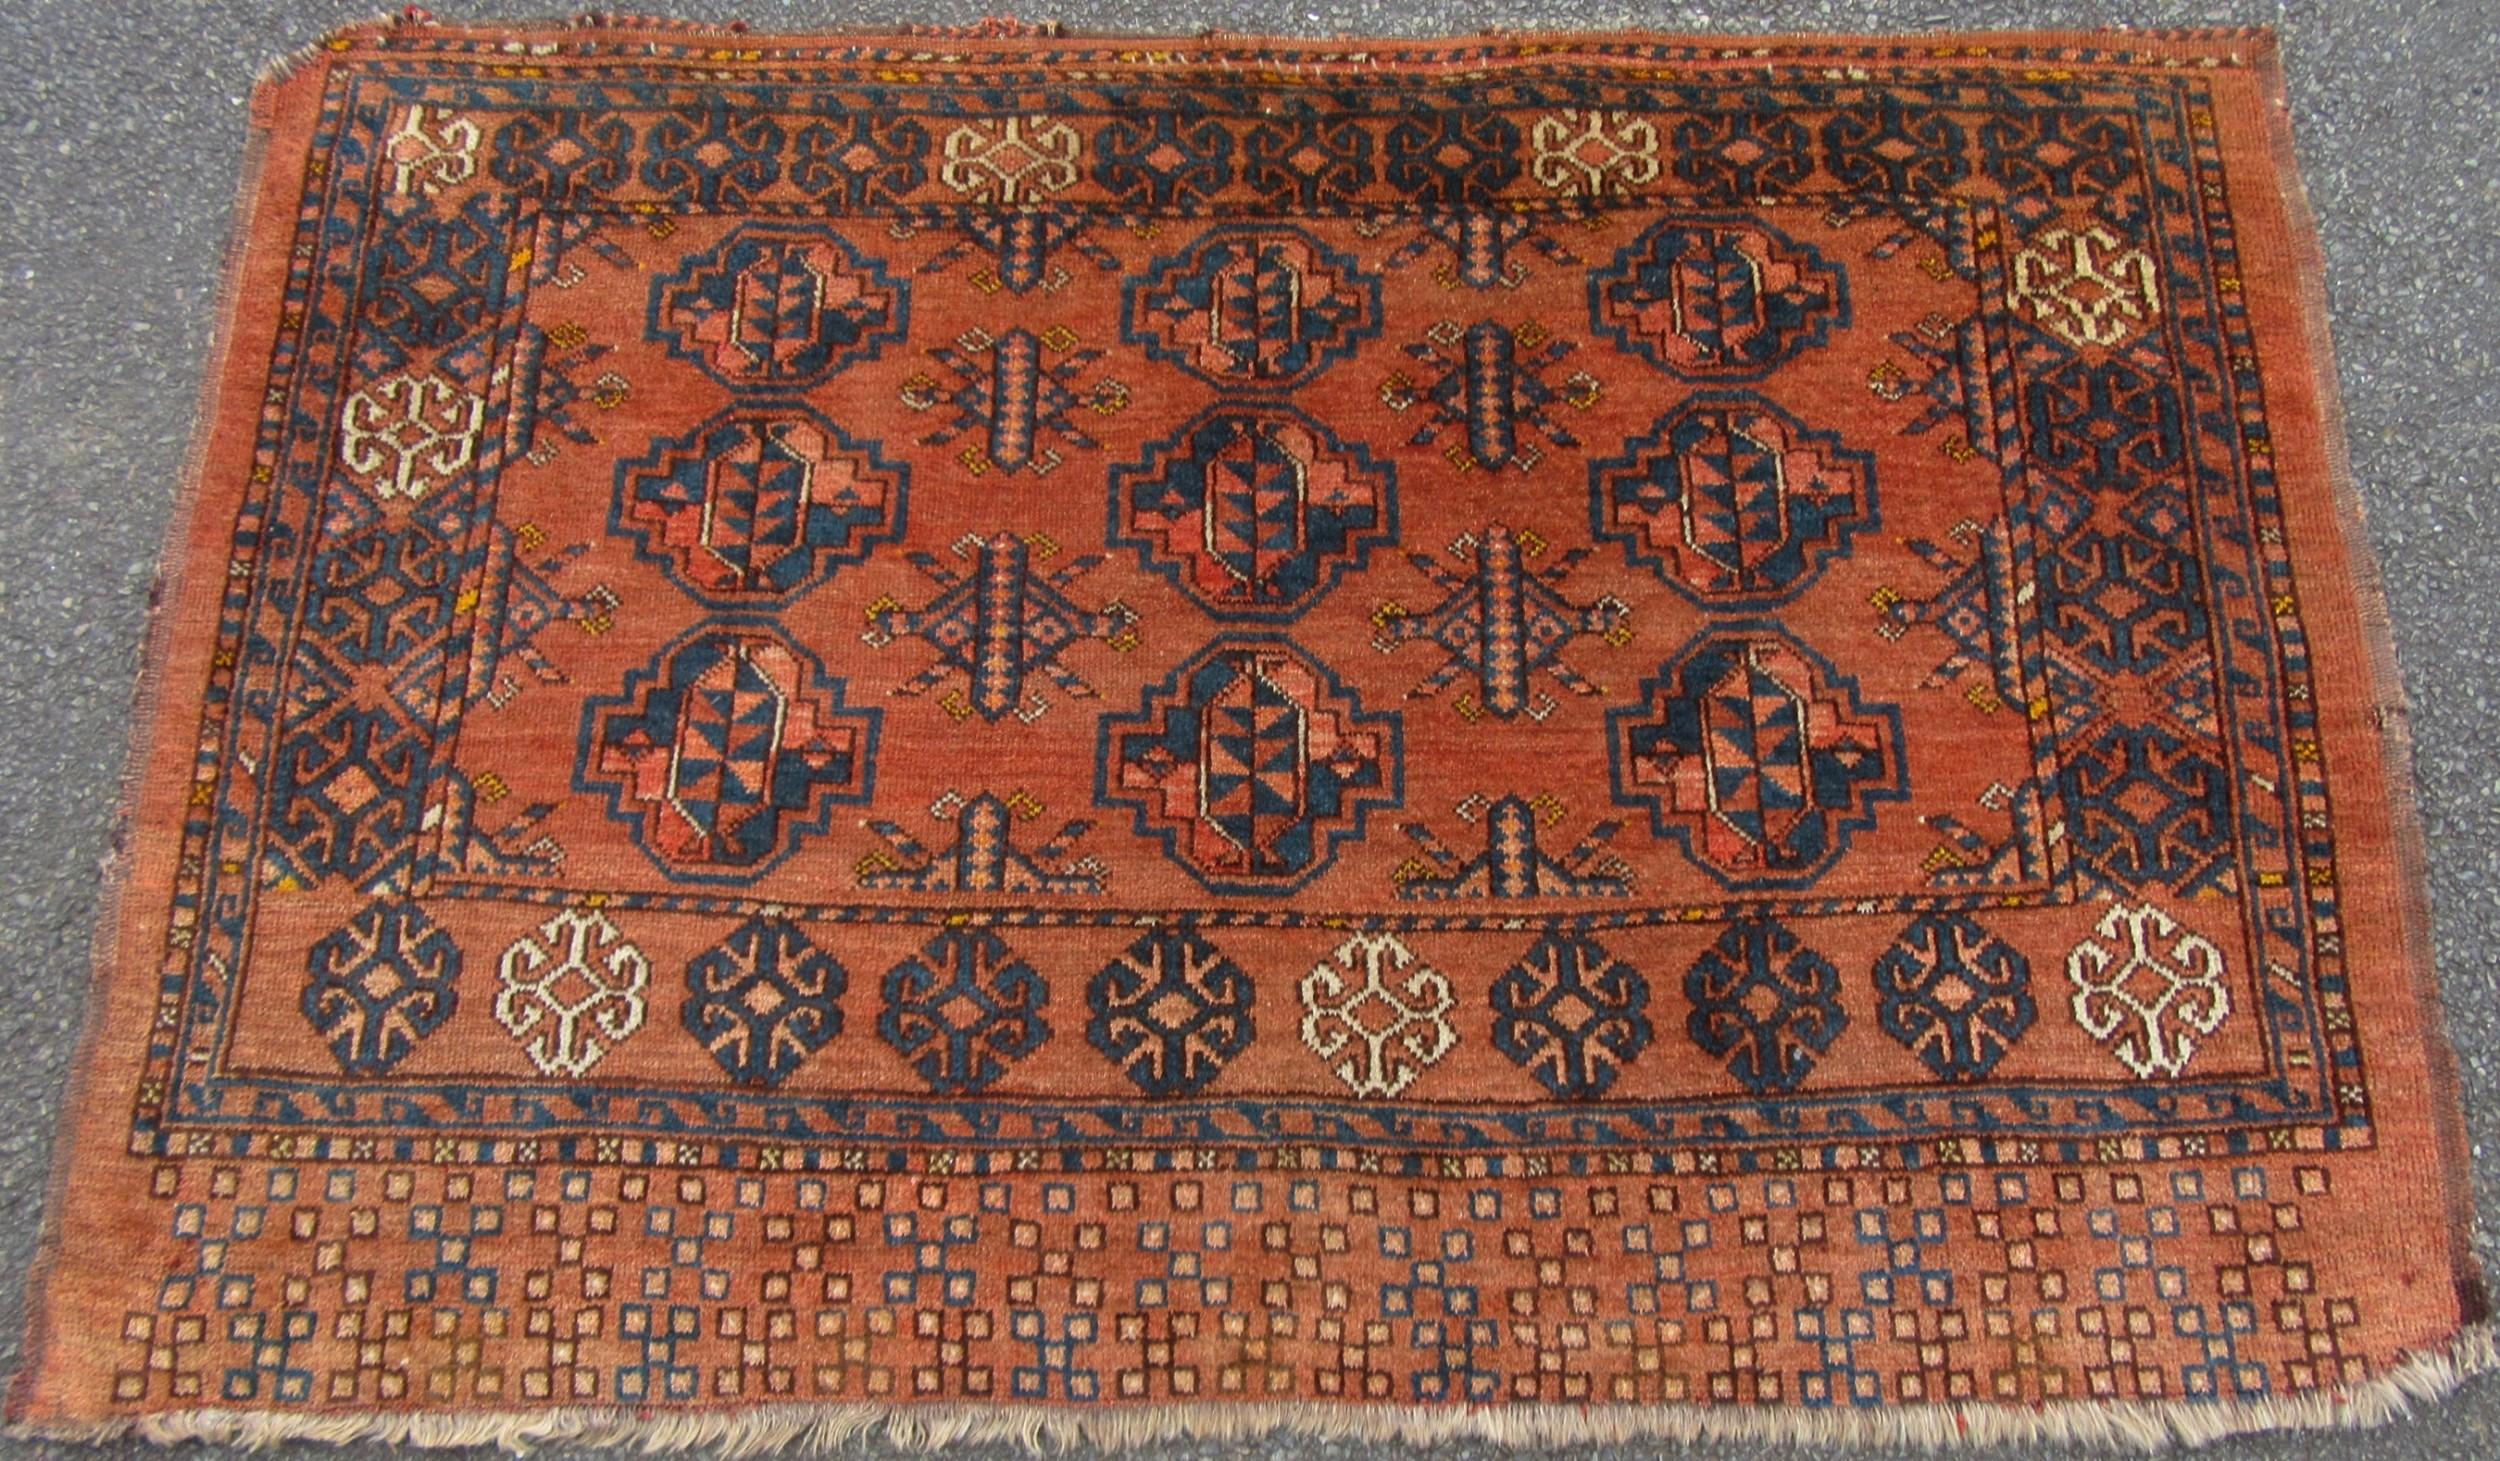 antique ersari turkmen chuval face rug 9 gul design variety of uses